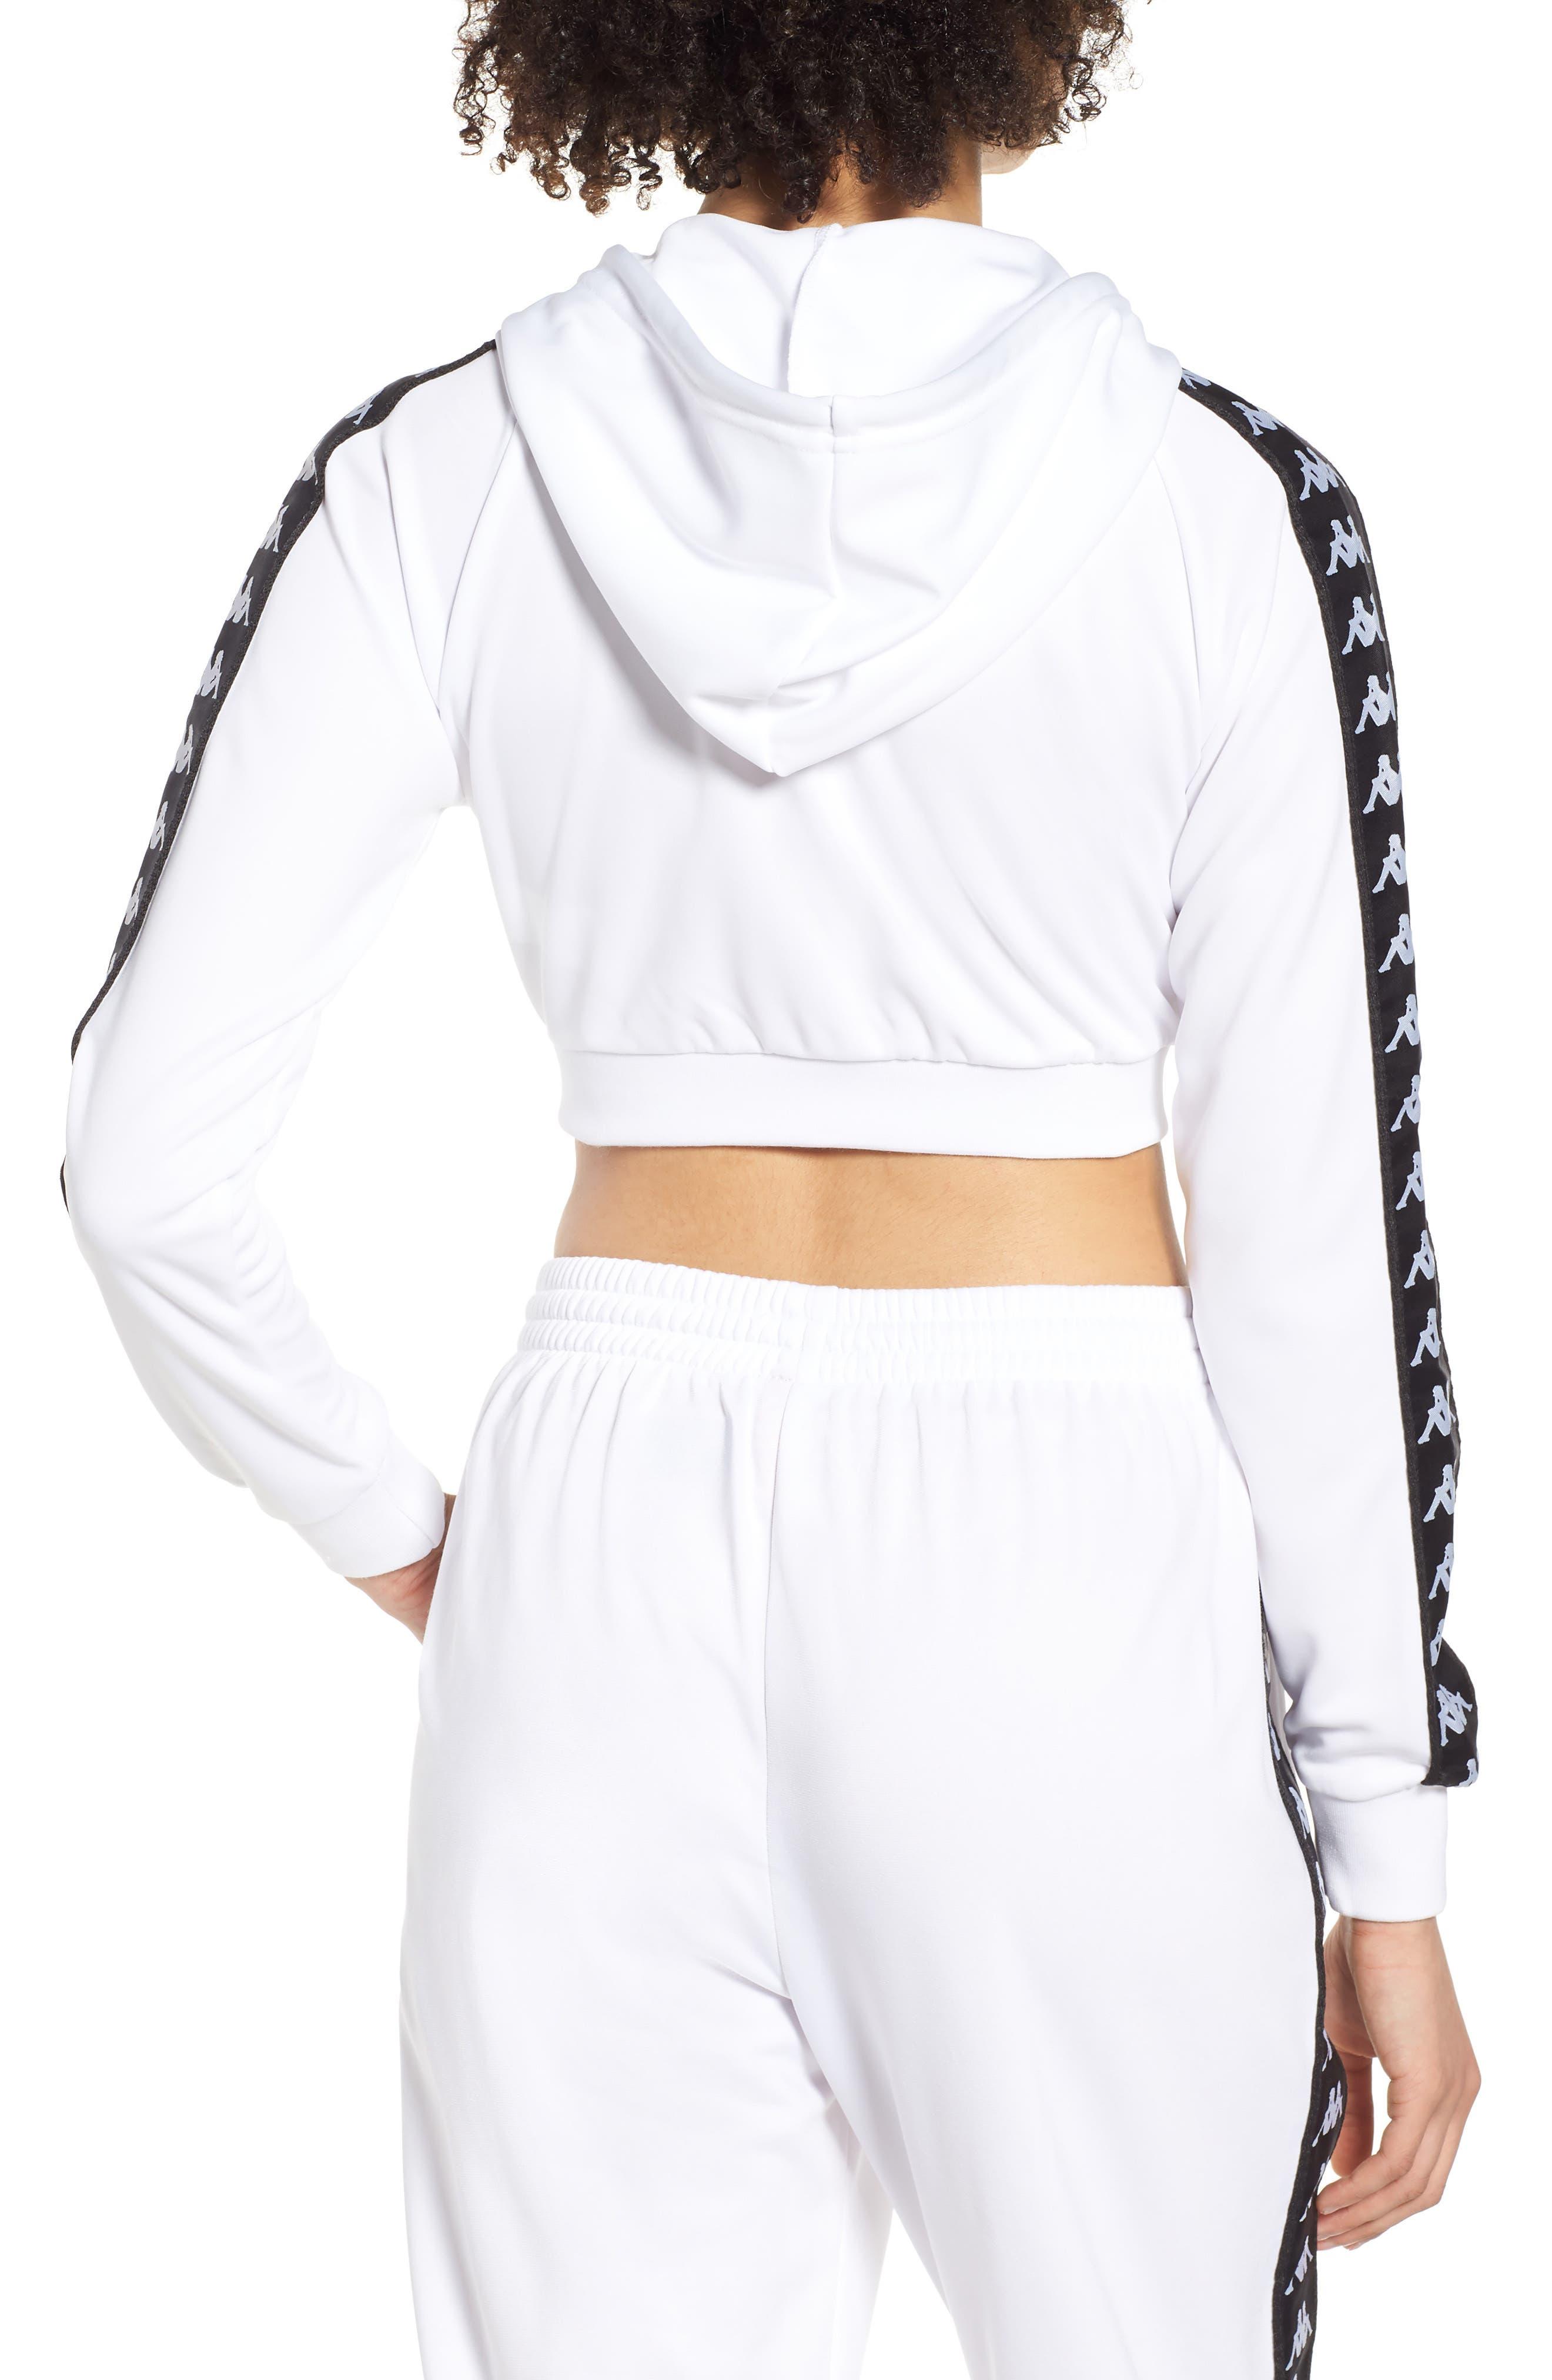 Banda Arakli Crop Jacket,                             Alternate thumbnail 2, color,                             White-Black